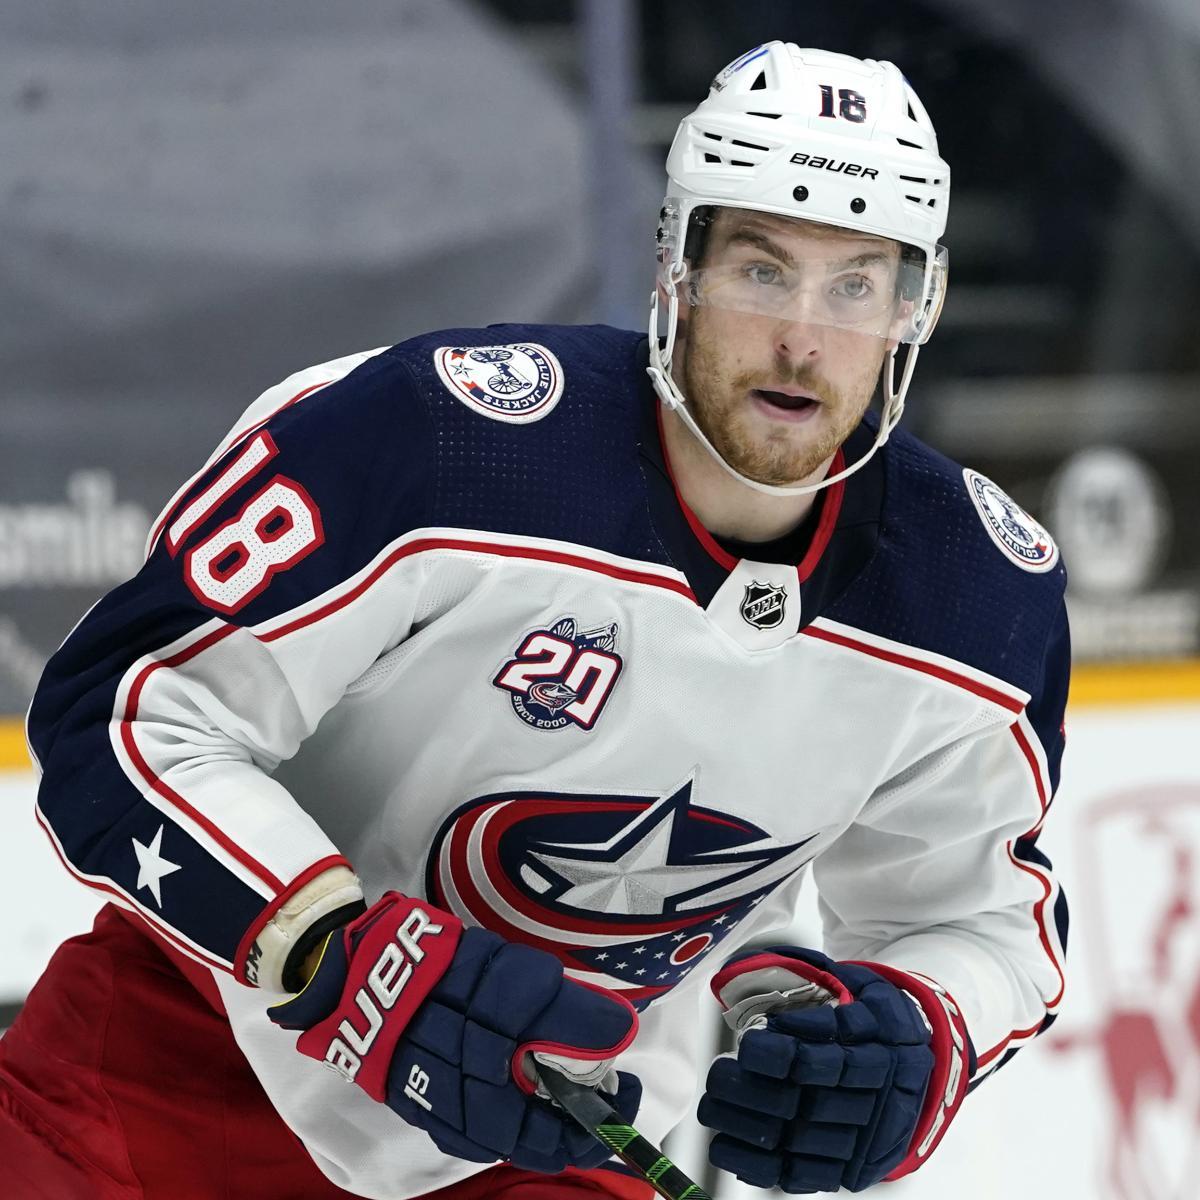 NHL Trade Rumors: Pierre-Luc Dubois Talks Heating Up Amid Blue Jackets Drama